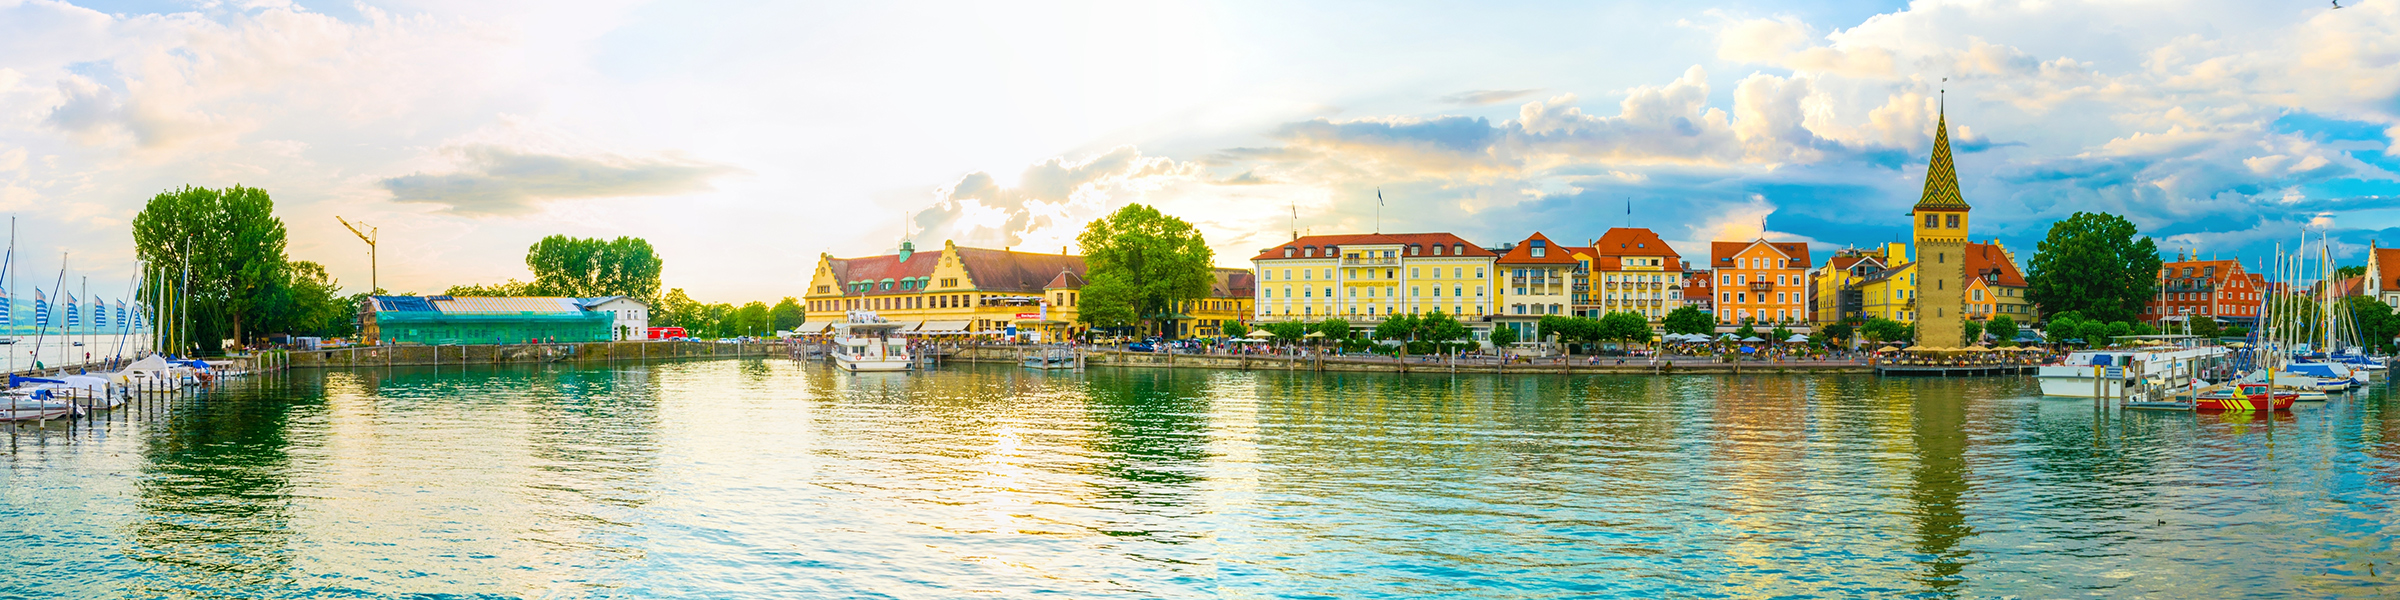 Germany Lake Constance Lindau